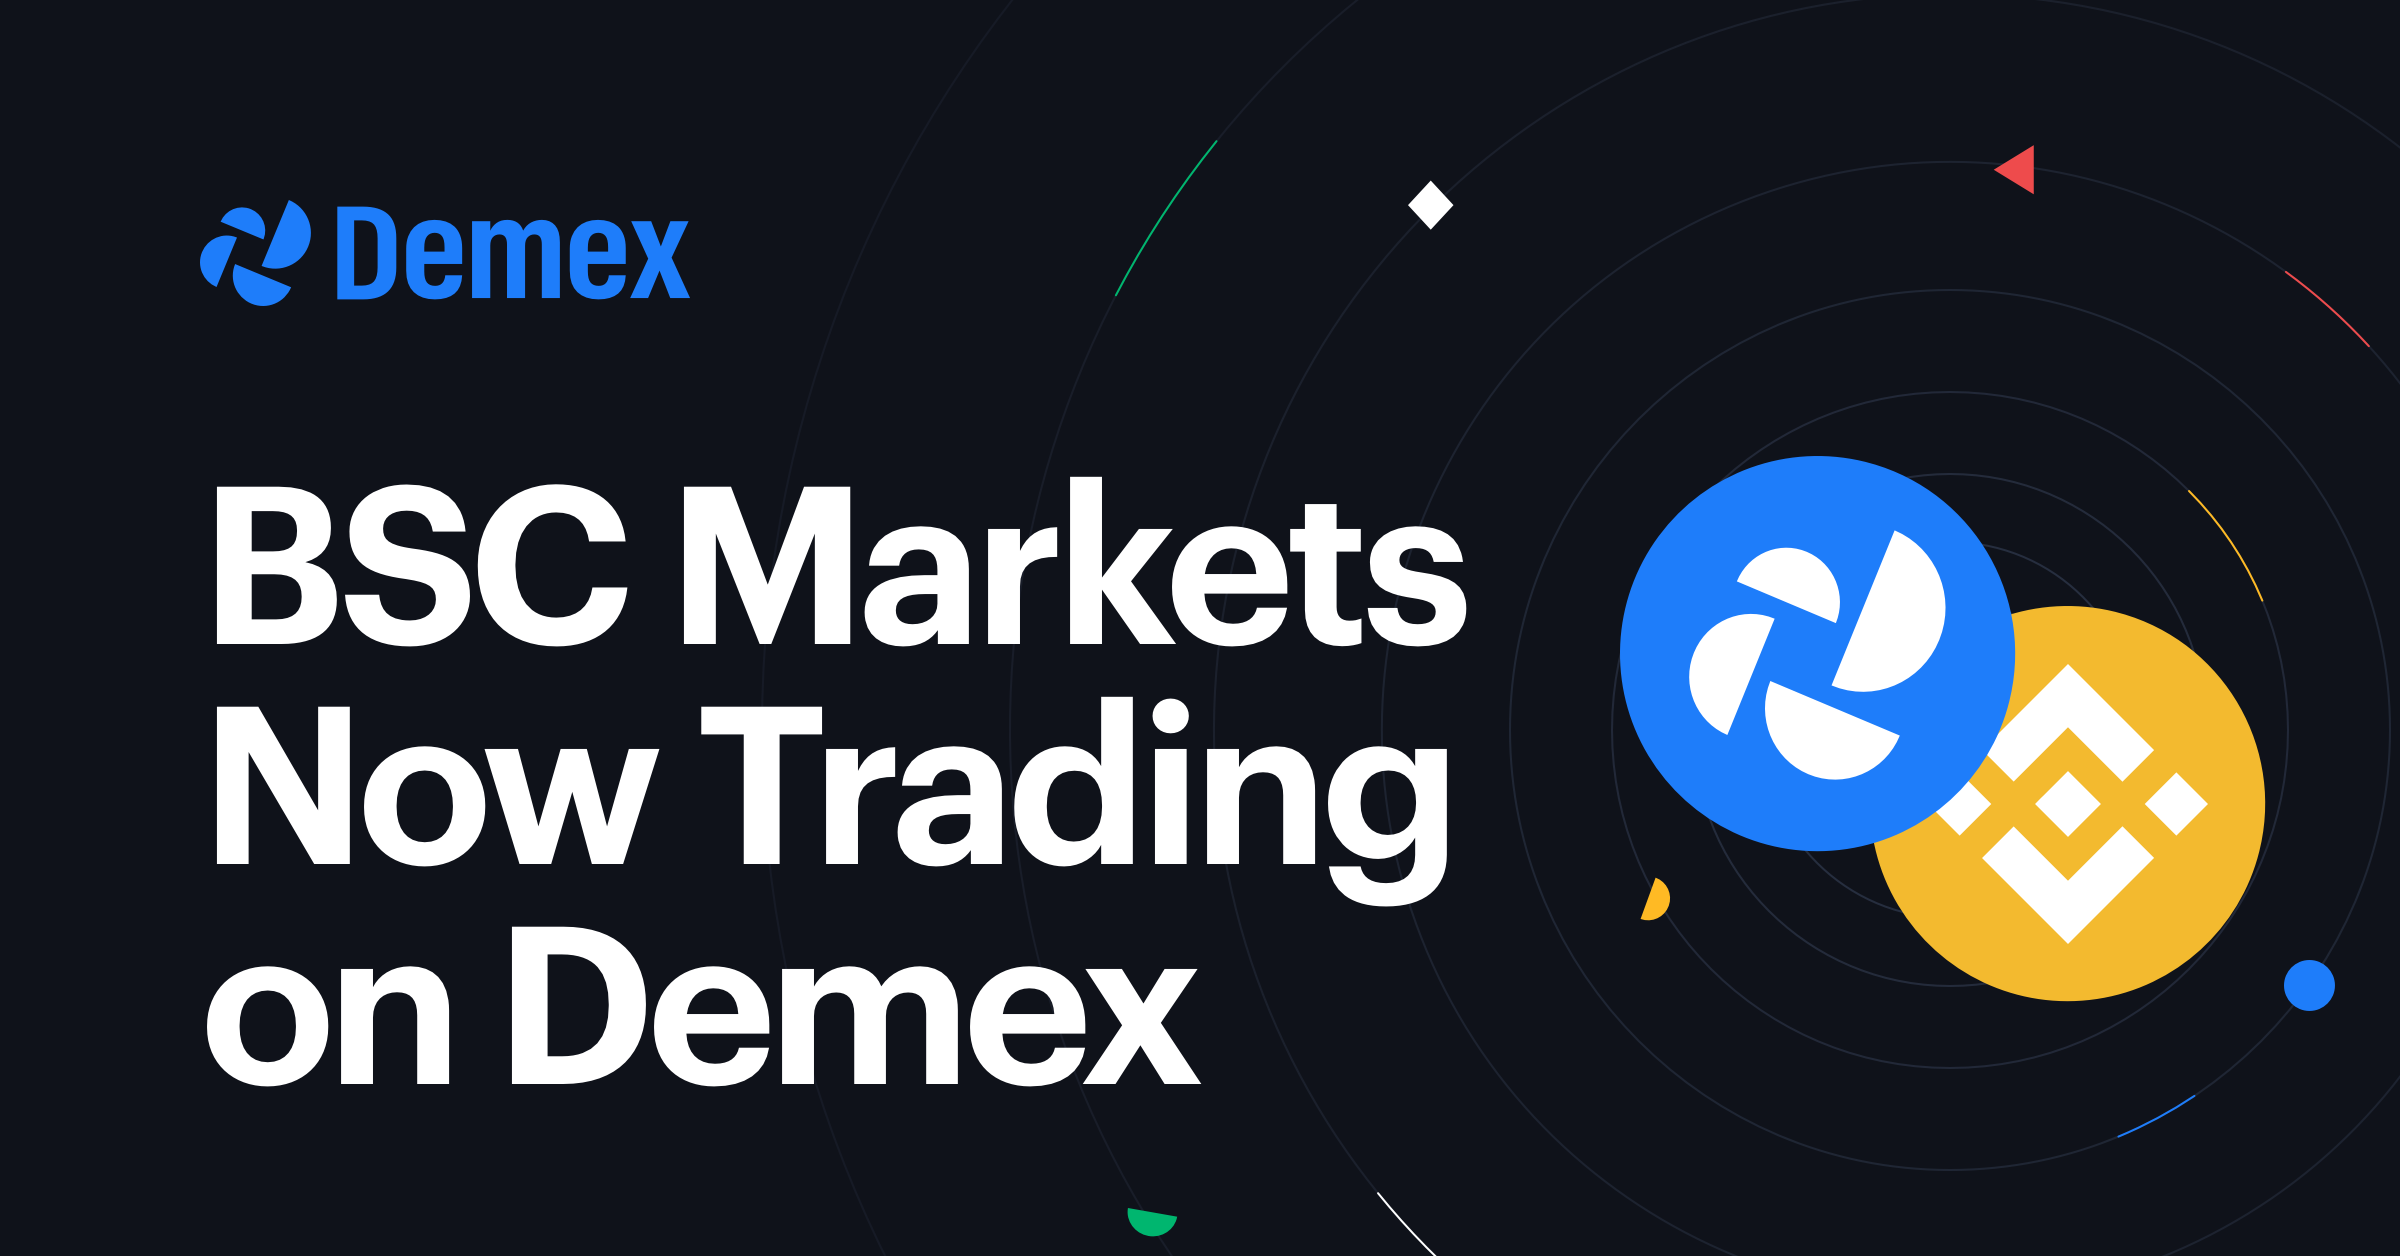 BSC markets now trading on Demex